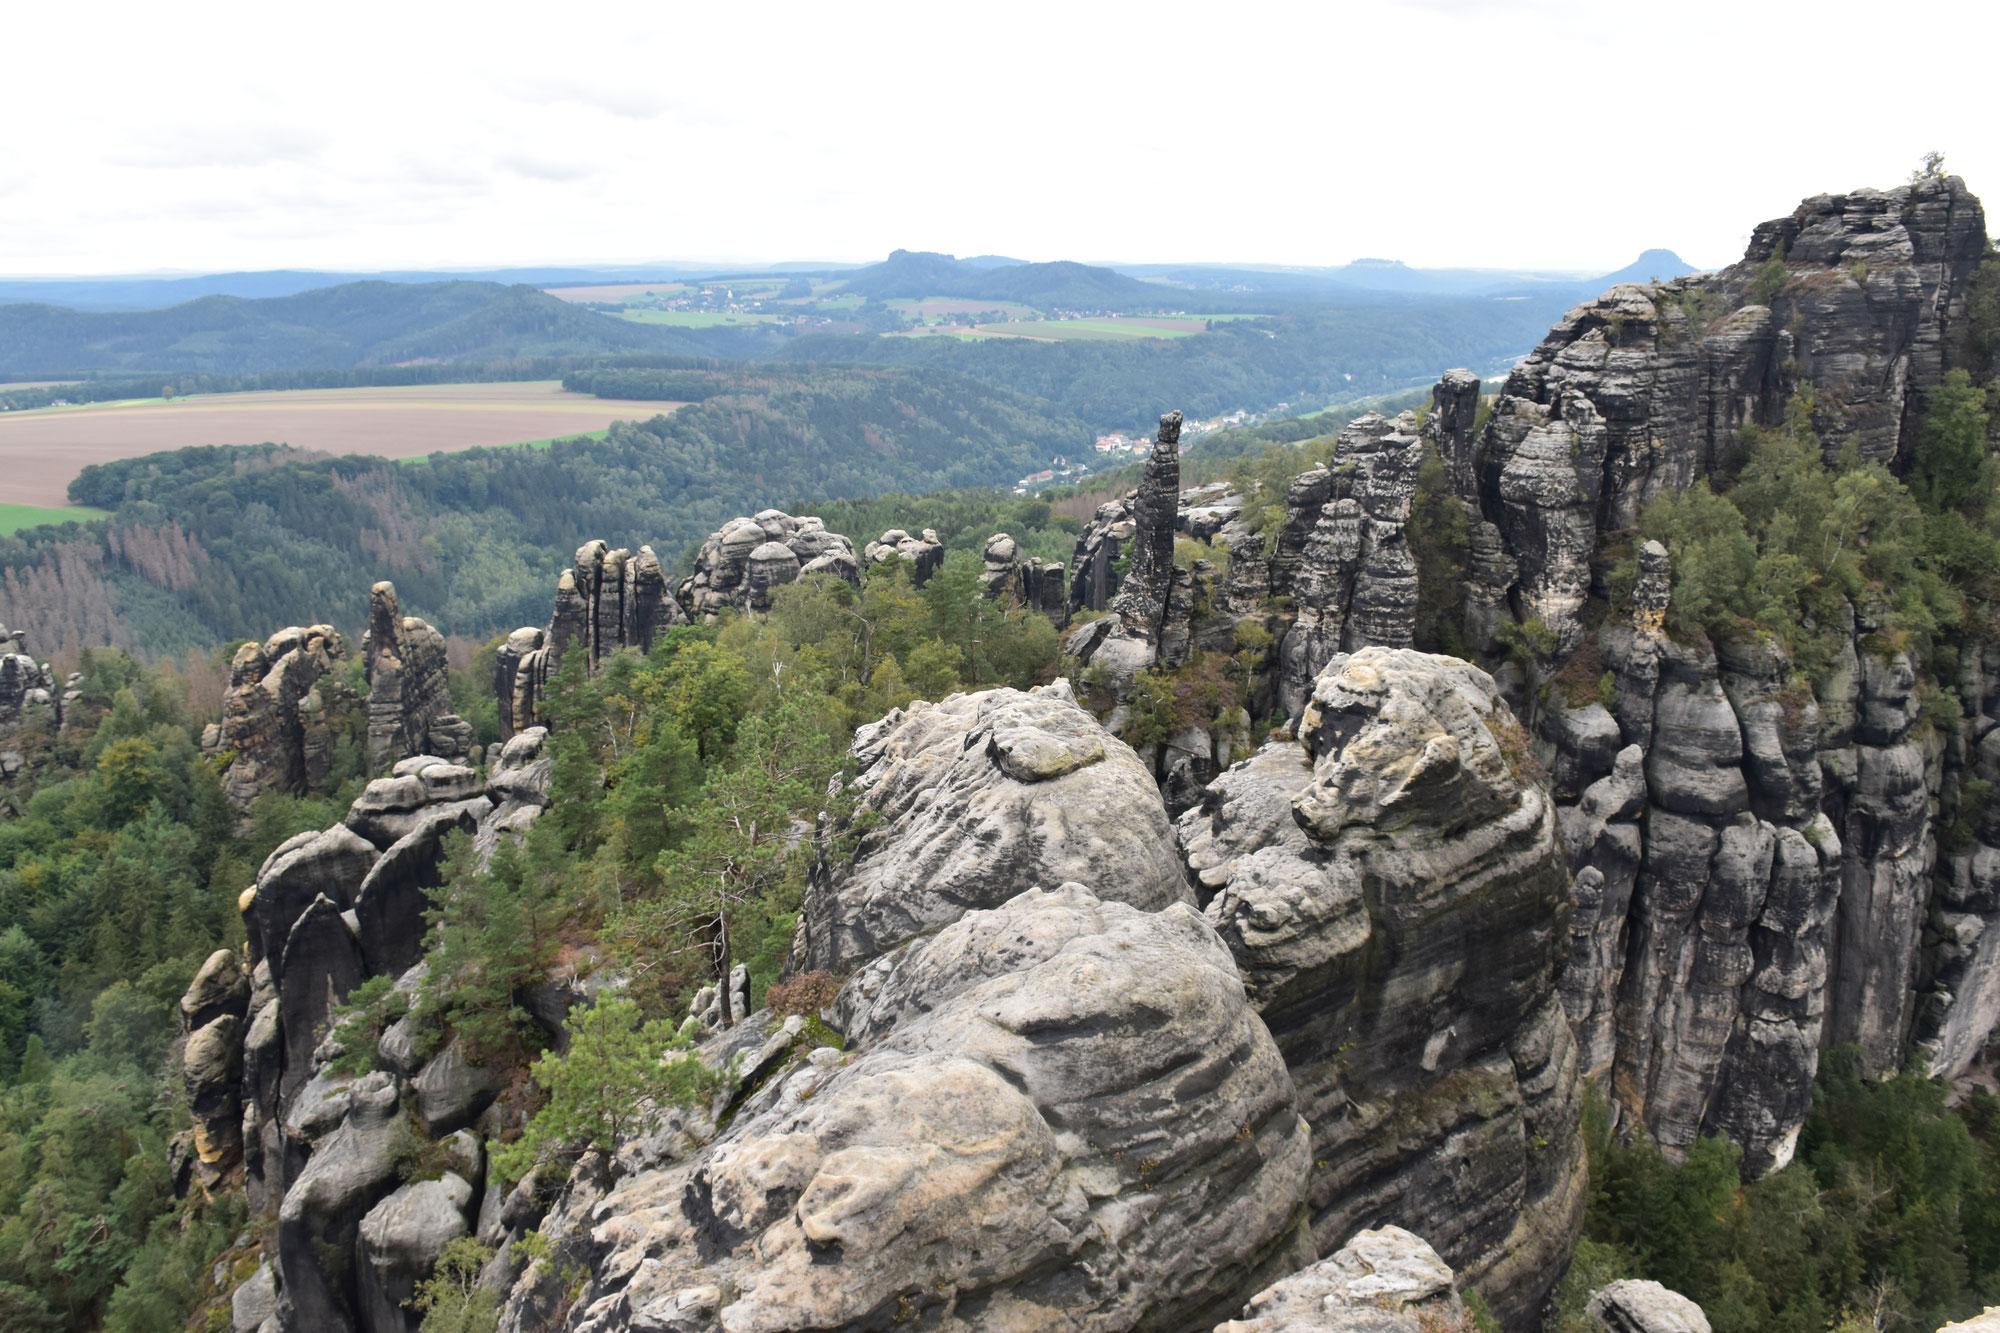 #5# Sächsische Schweiz / Elbsandsteingebirge